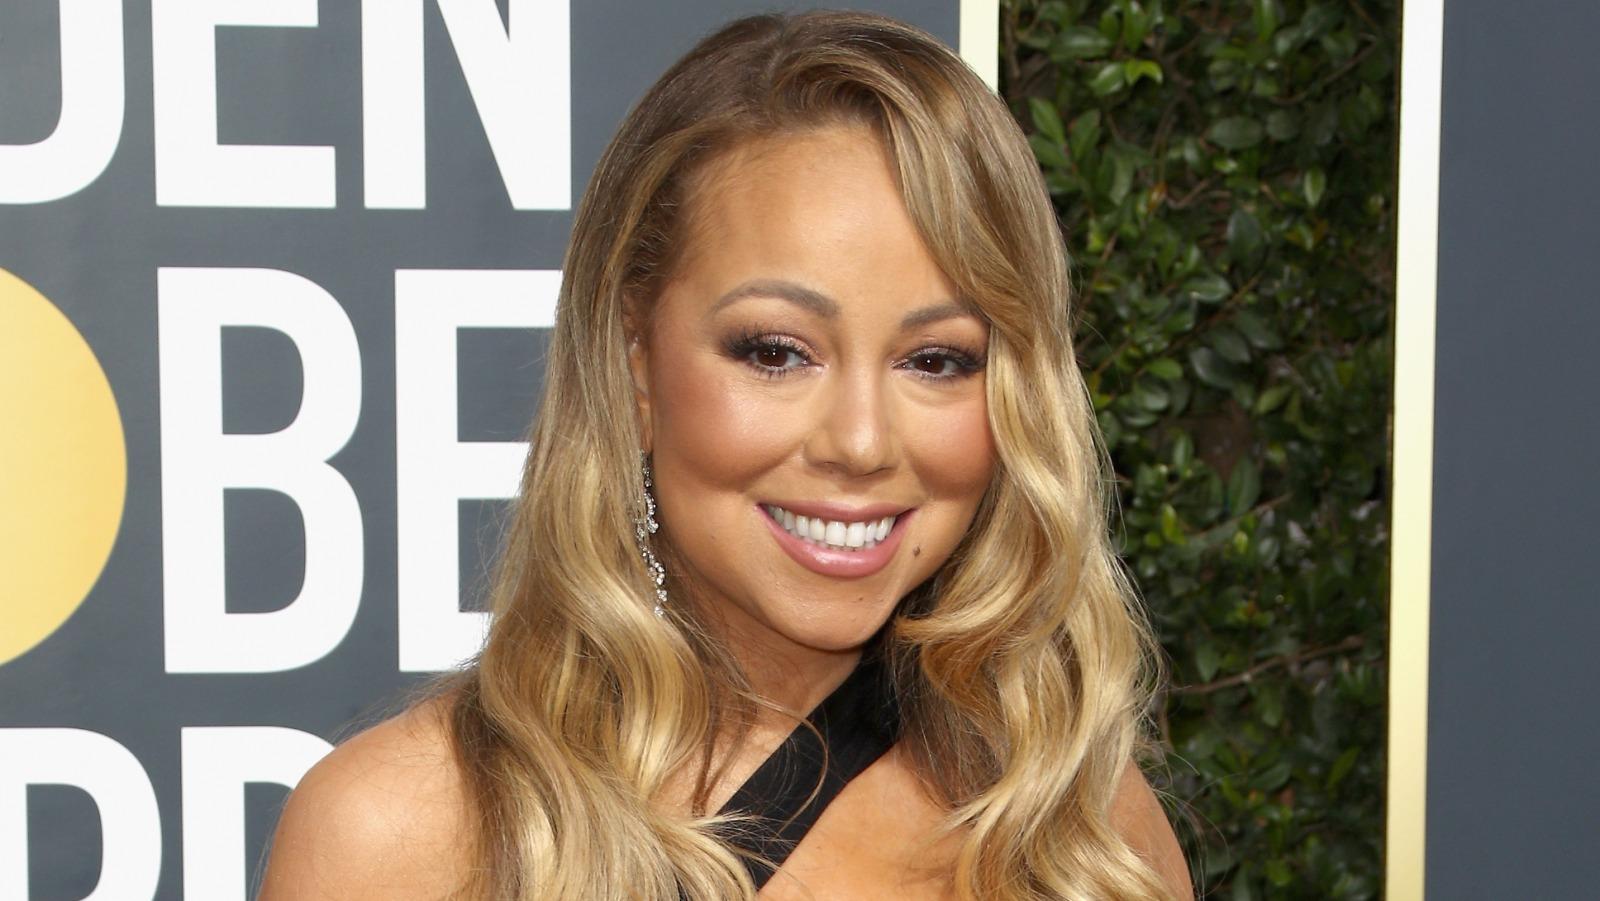 The lovey names Mariah Carey has for her estranged siblings